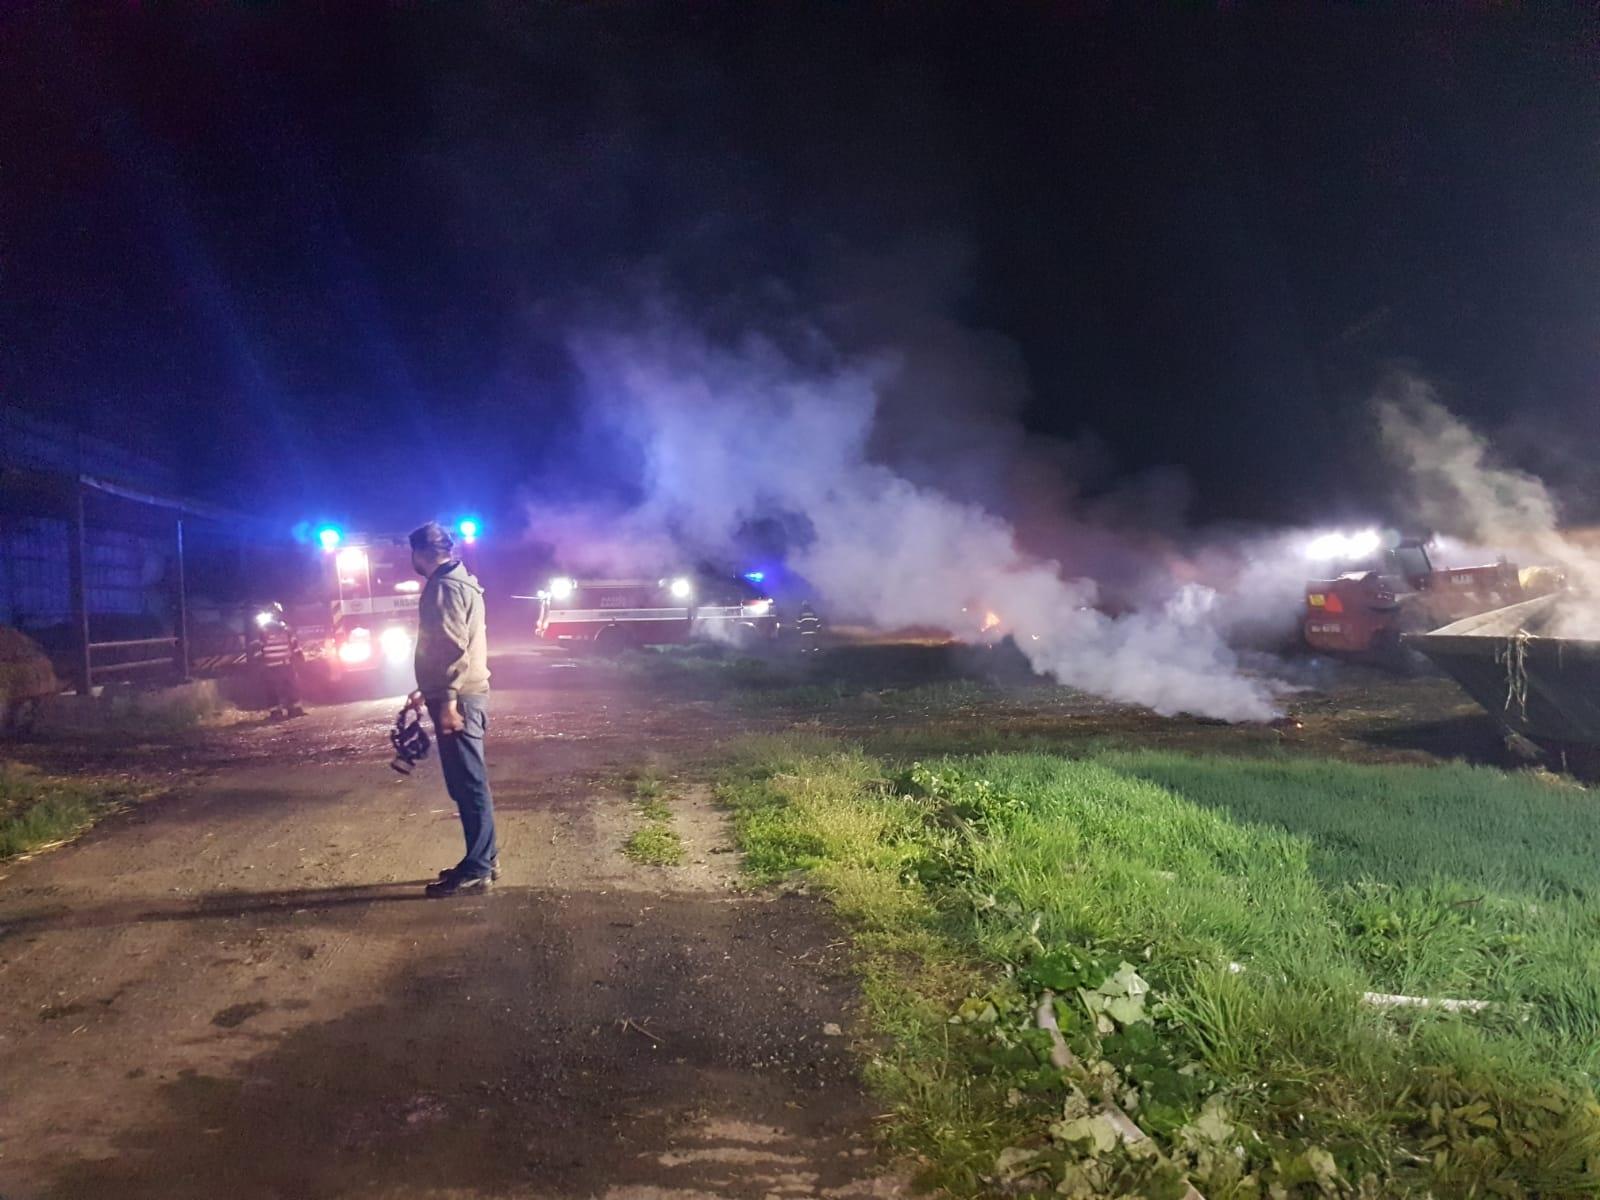 Olomoucký kraj - zásah hasičů zdroj foto: HZS OLK